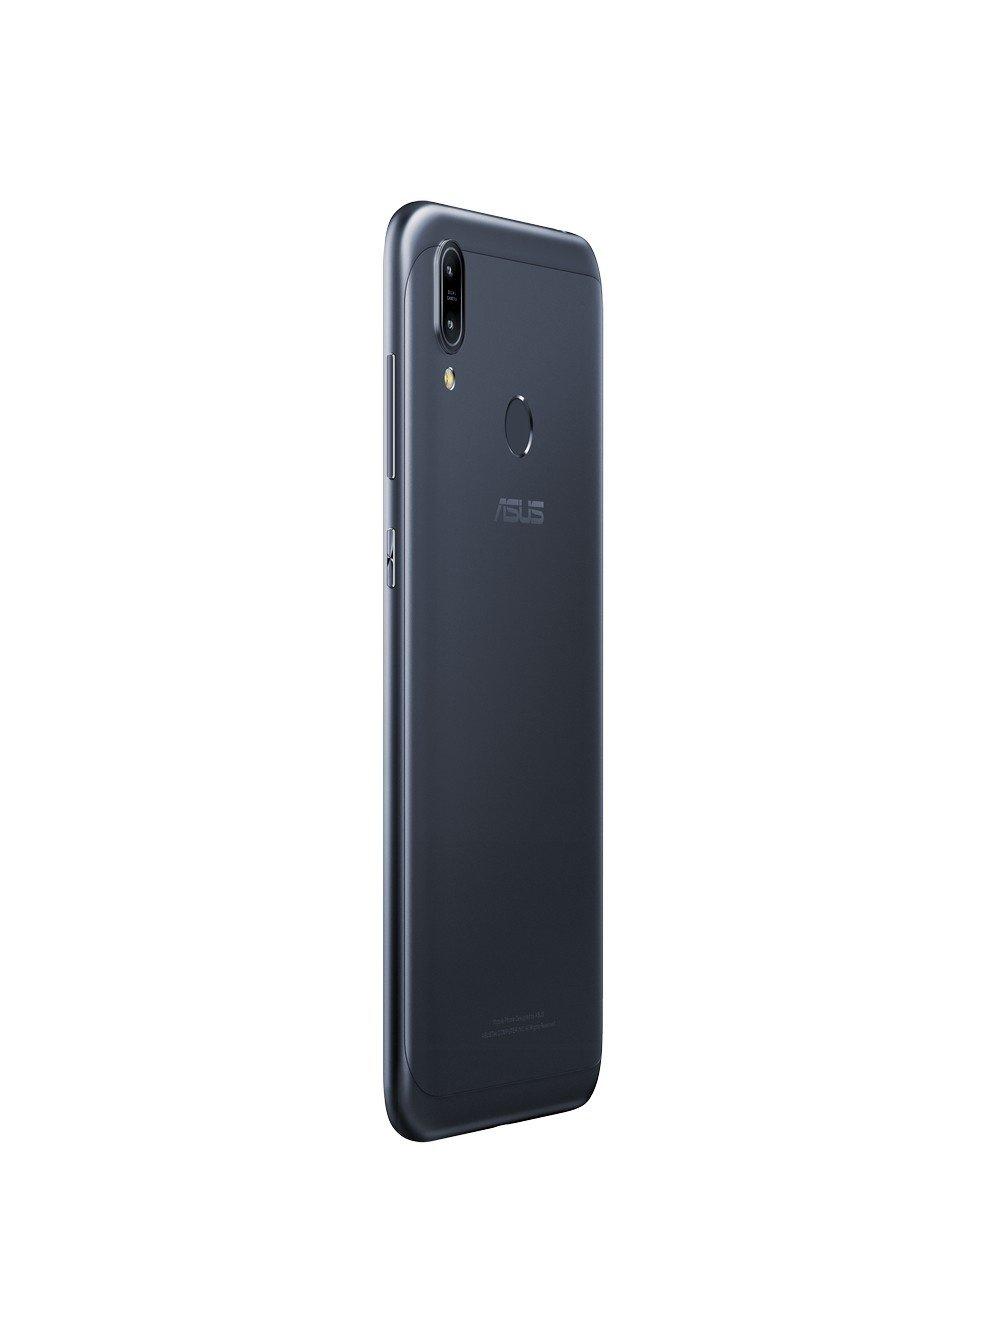 Смартфон Asus ZenFone Max (M2) (ZB633KL-4A070EU) 4/32 GB DUALSIM Black с чехлом фото 10